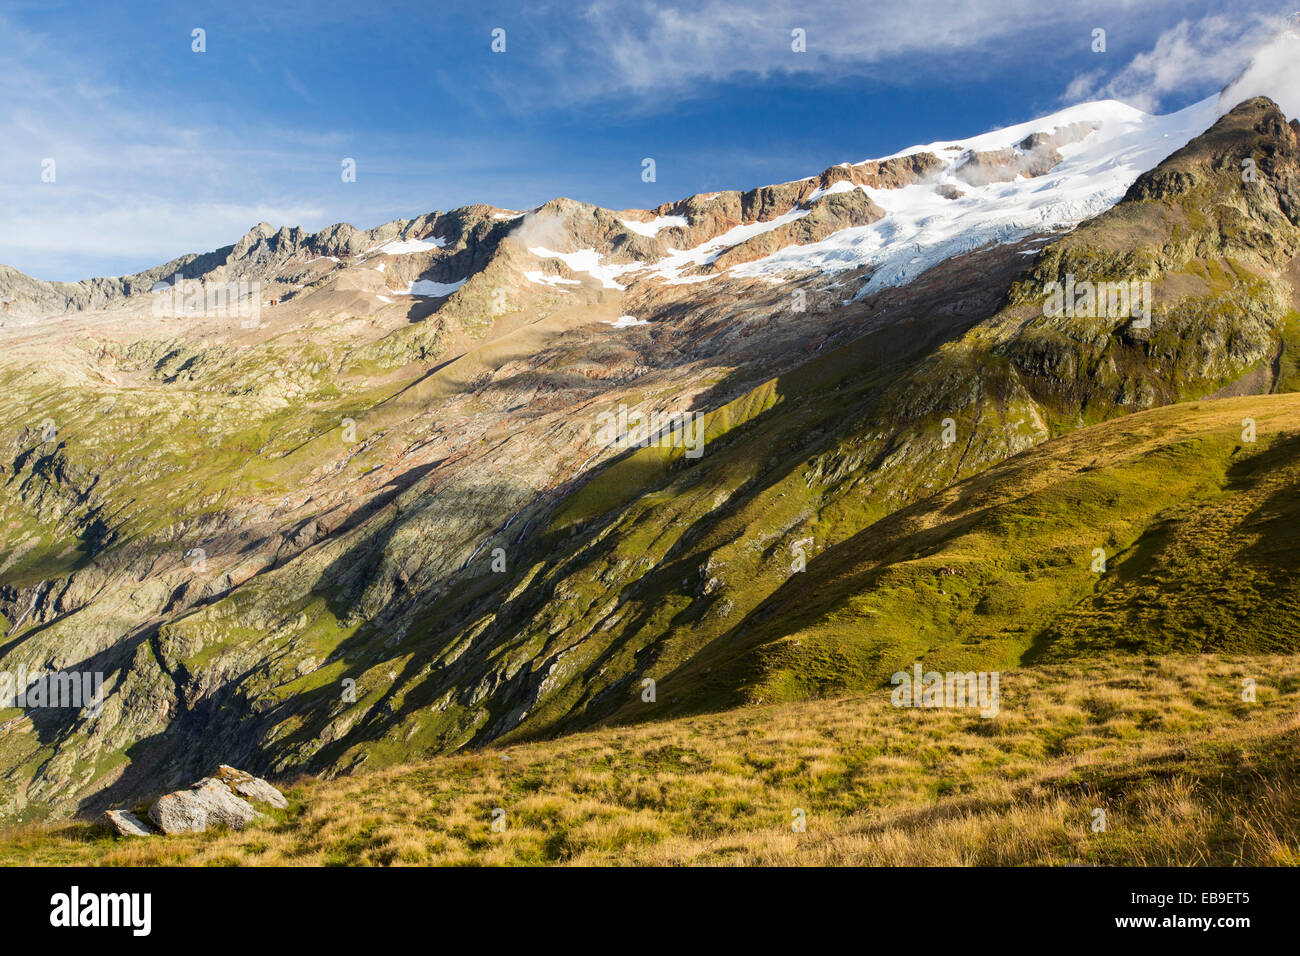 The rapidly retreating Glacier des glaciers on the Aig des Glaciers, part of the Mont Blanc range. The lateral moraines - Stock Image